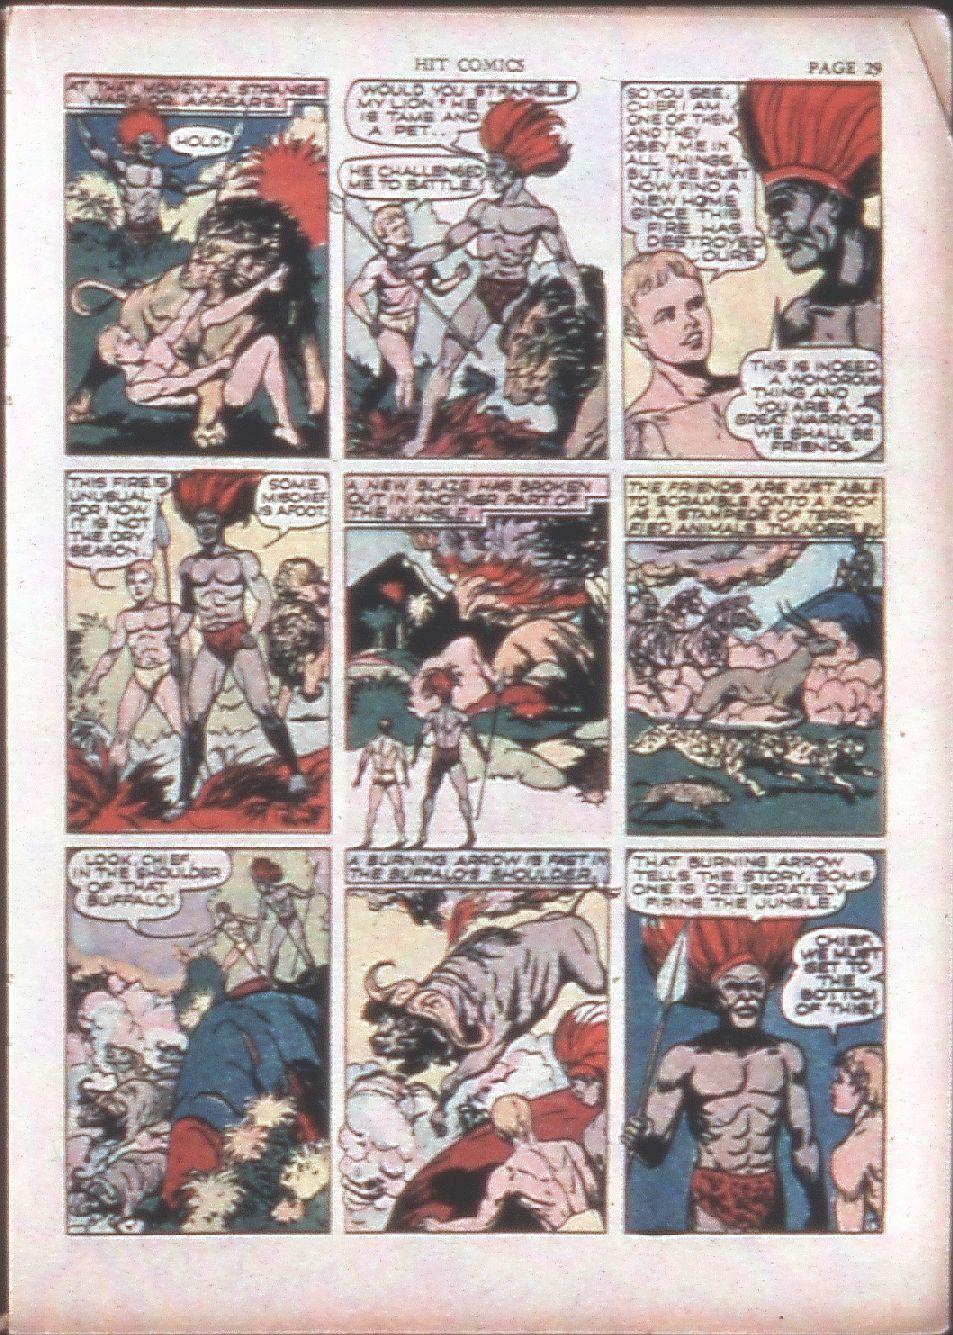 Read online Hit Comics comic -  Issue #15 - 31